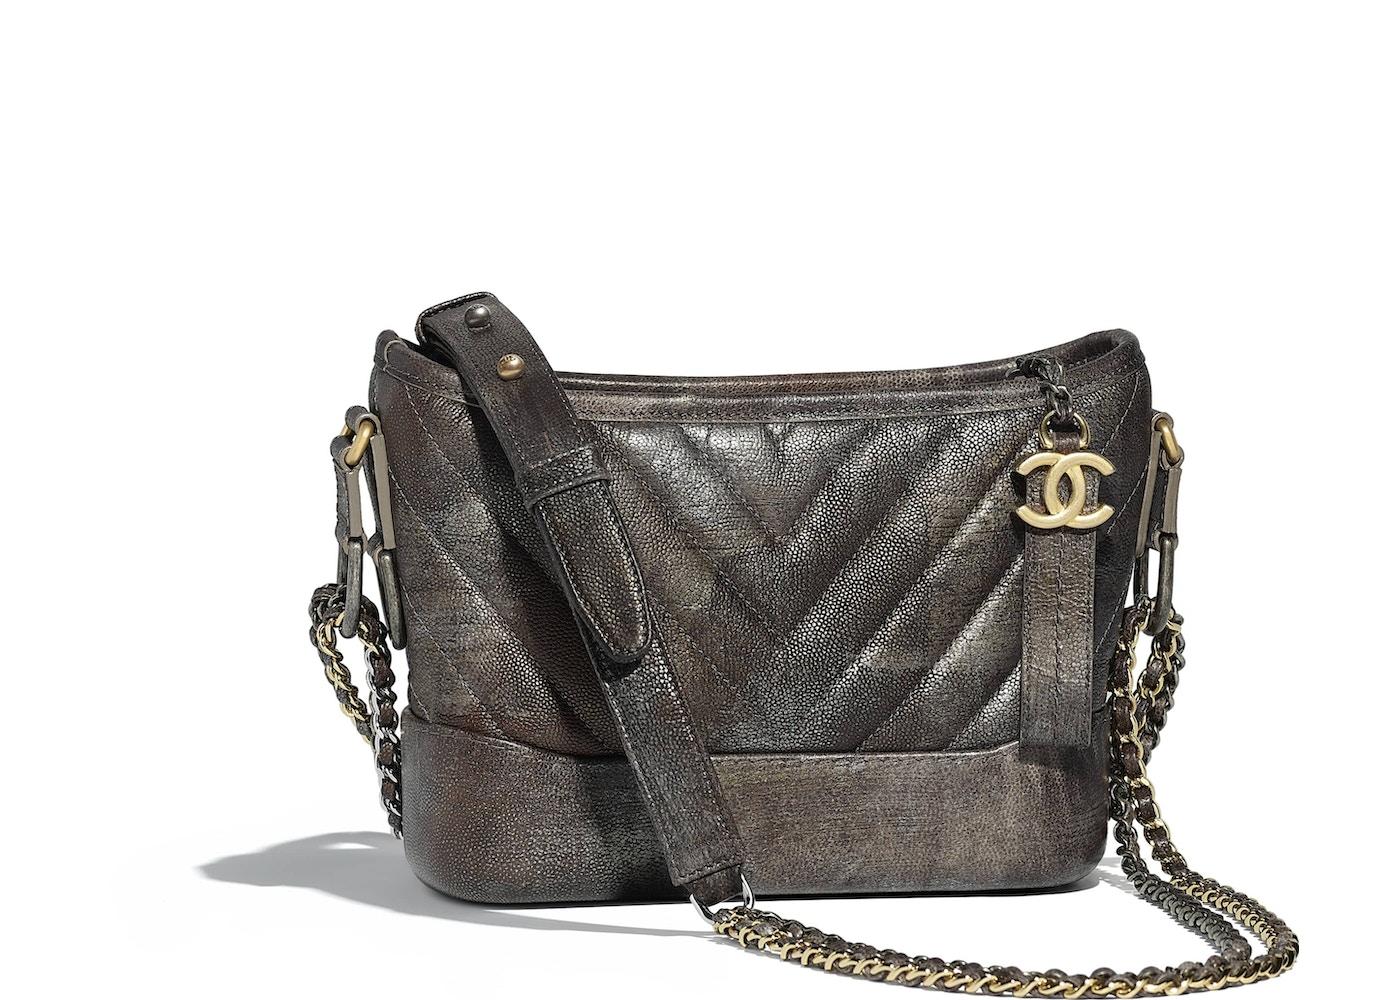 85577eeac1aa Chanel Gabrielle Hobo Bag Quilted Chevron Metallic Small Dark ...